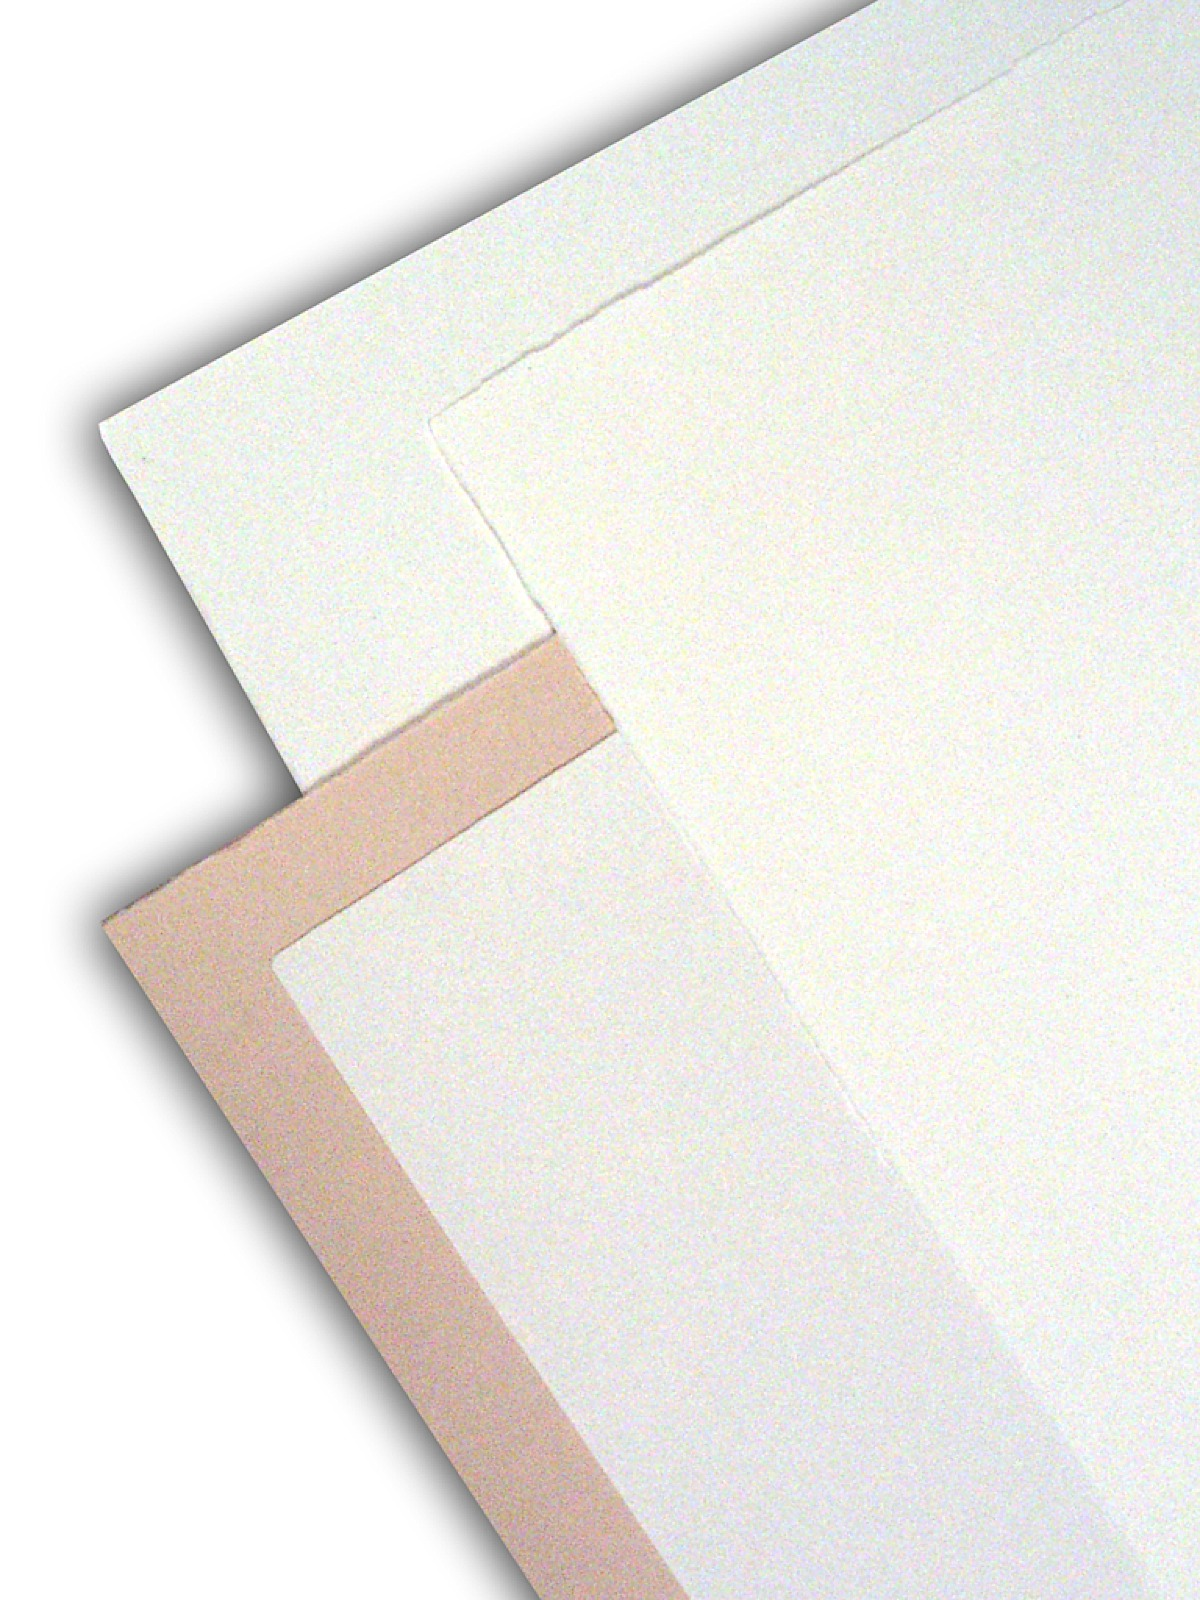 printmaking essay